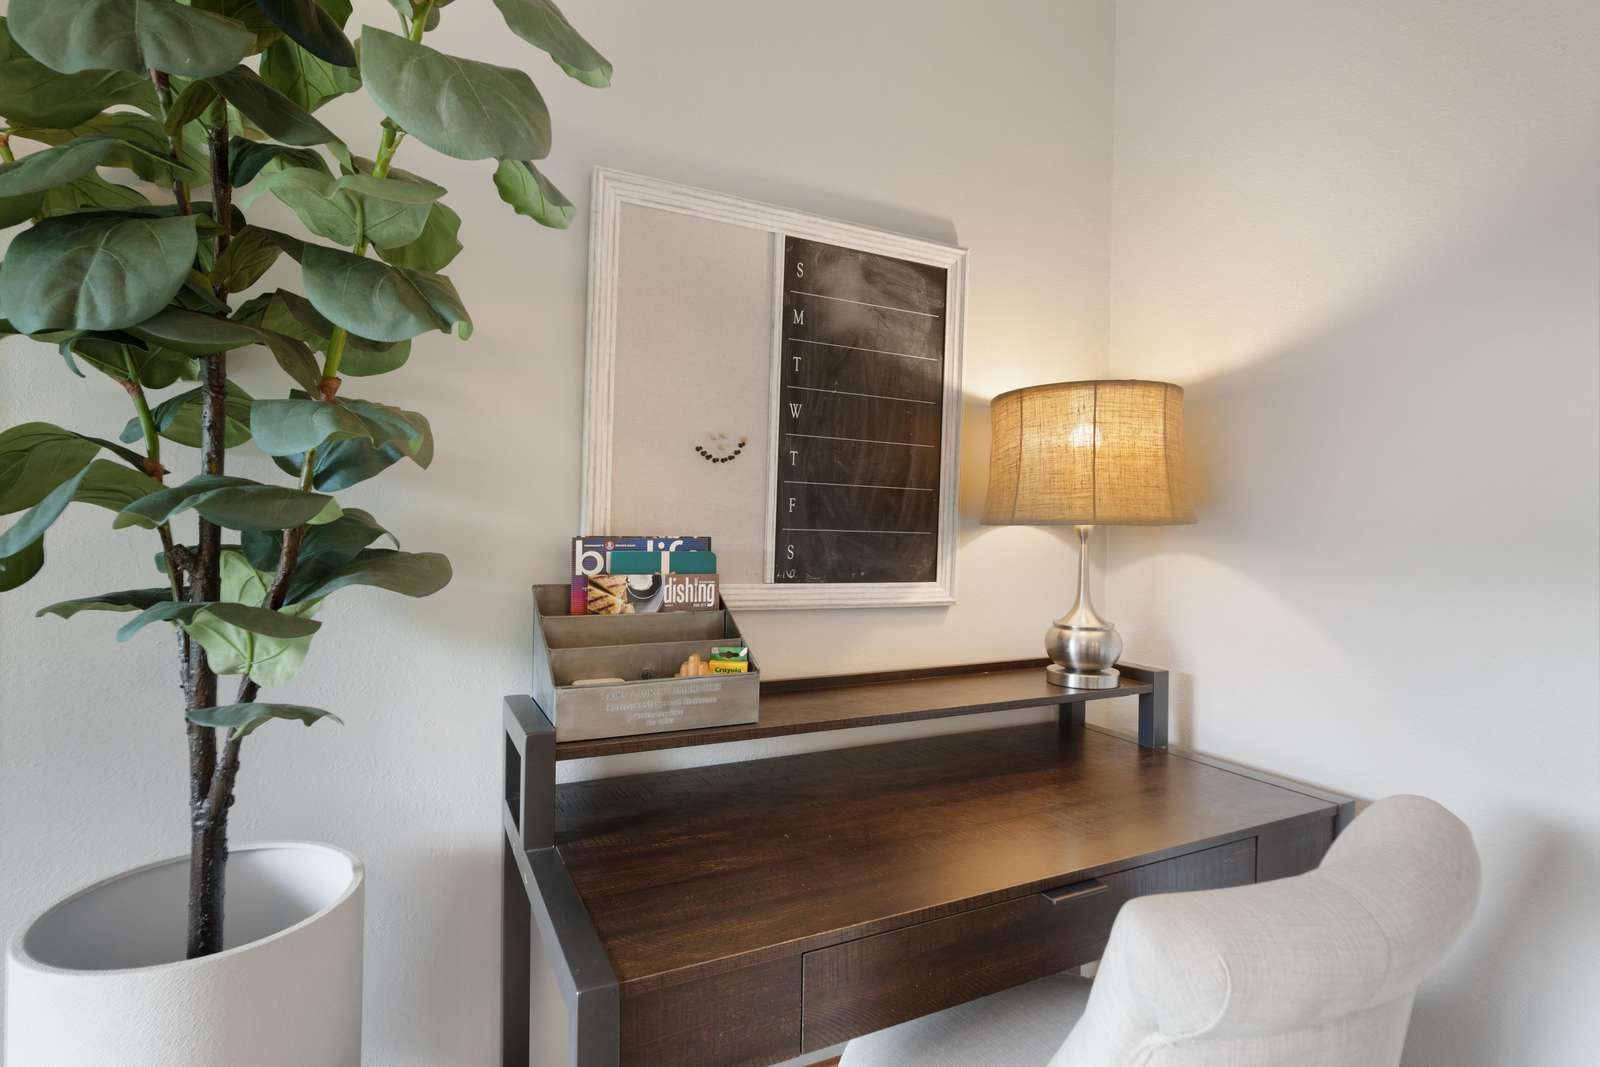 Living Room Study Desk